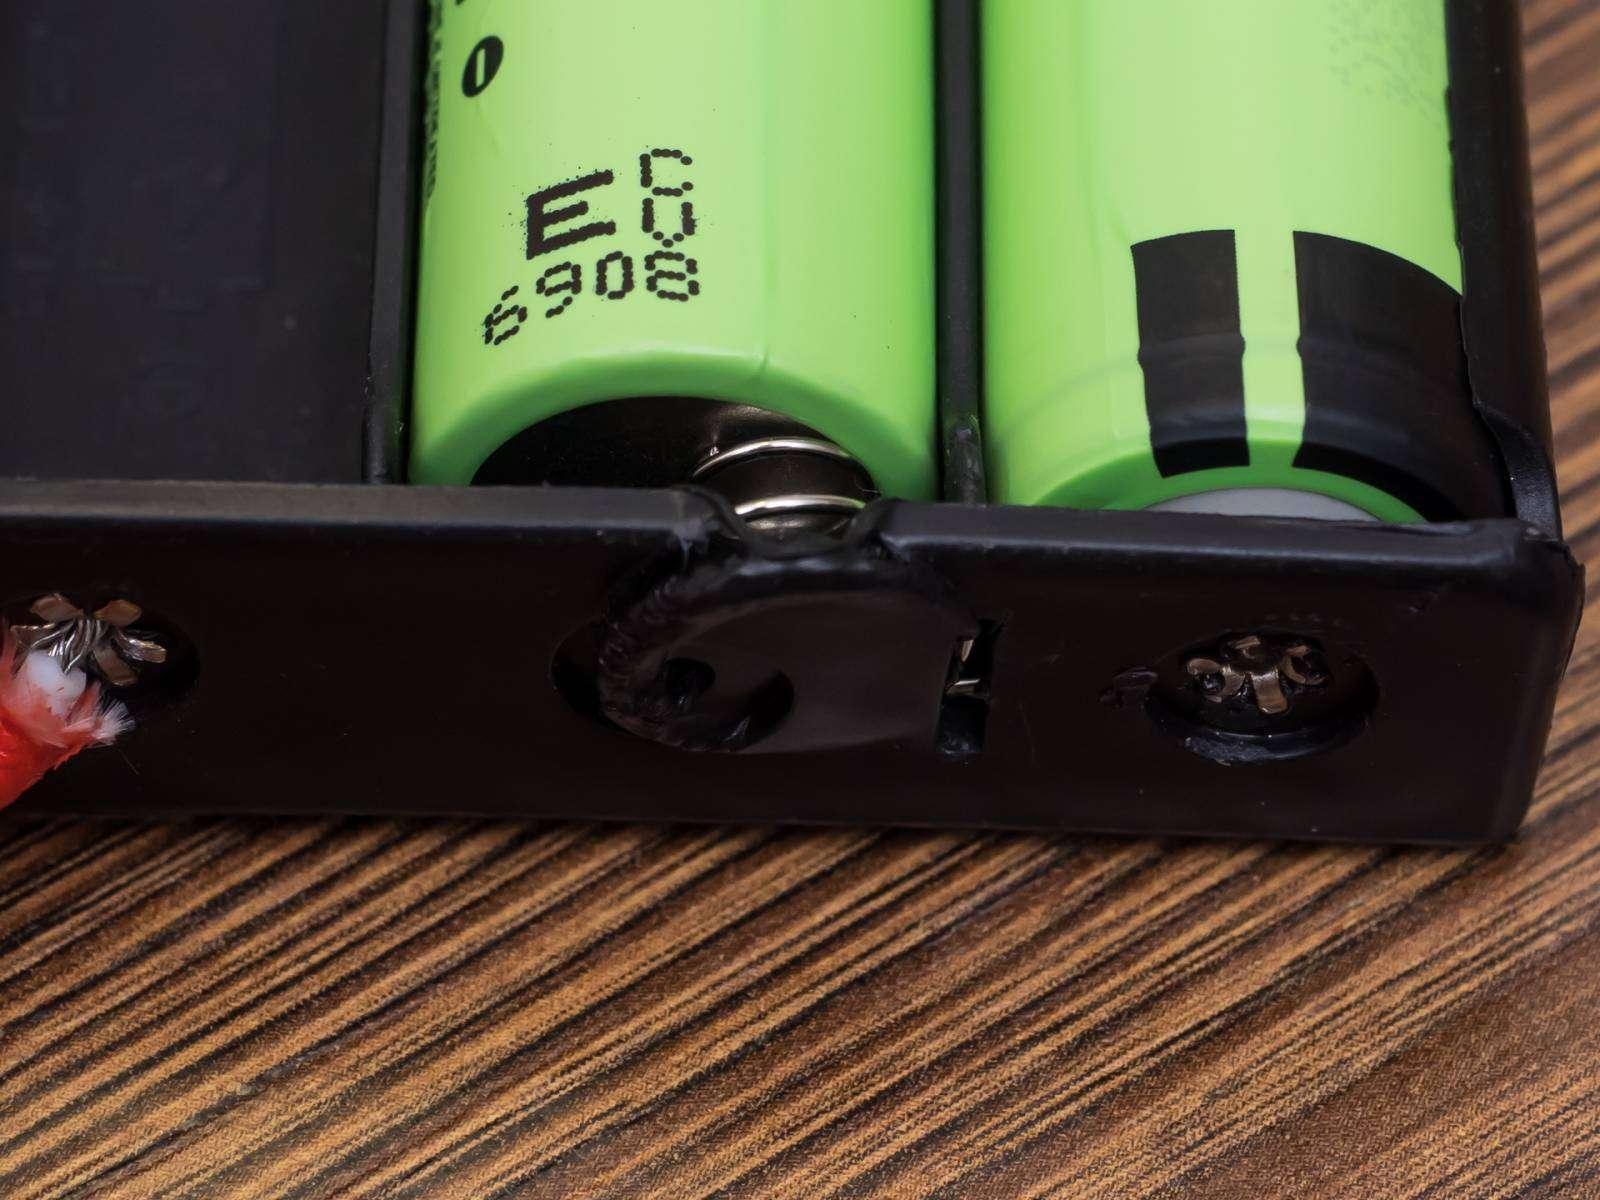 GearBest: DC-DC повышающий конвертер часть 2 - замеры, powerbank для ноутбука